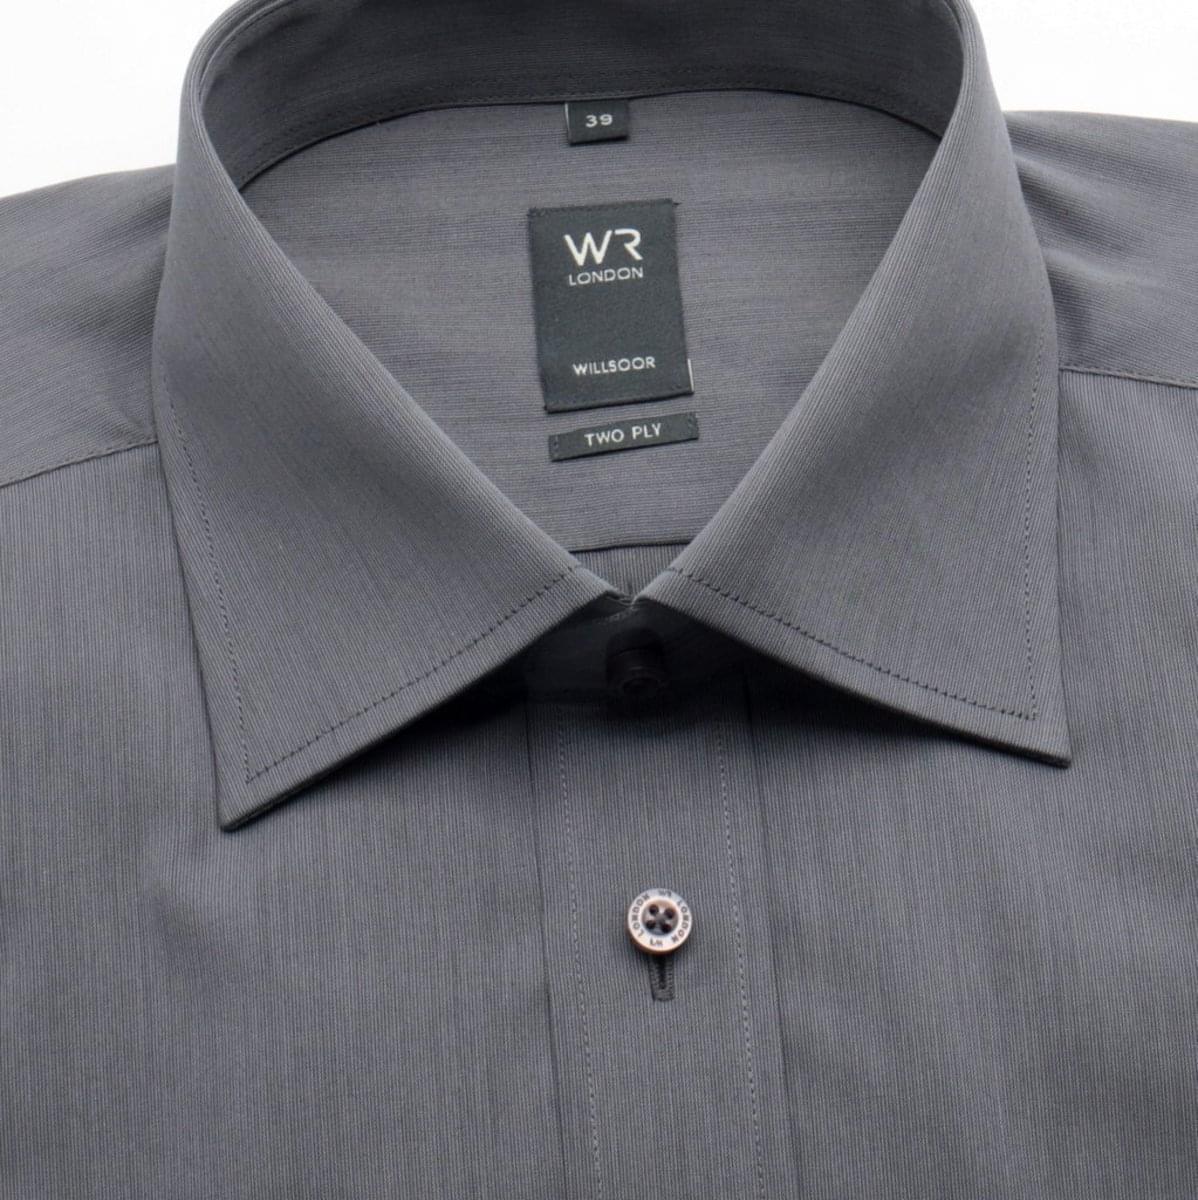 Pánska košele WR London Slim Fit (výška 188/194) 526 188-194 / 40